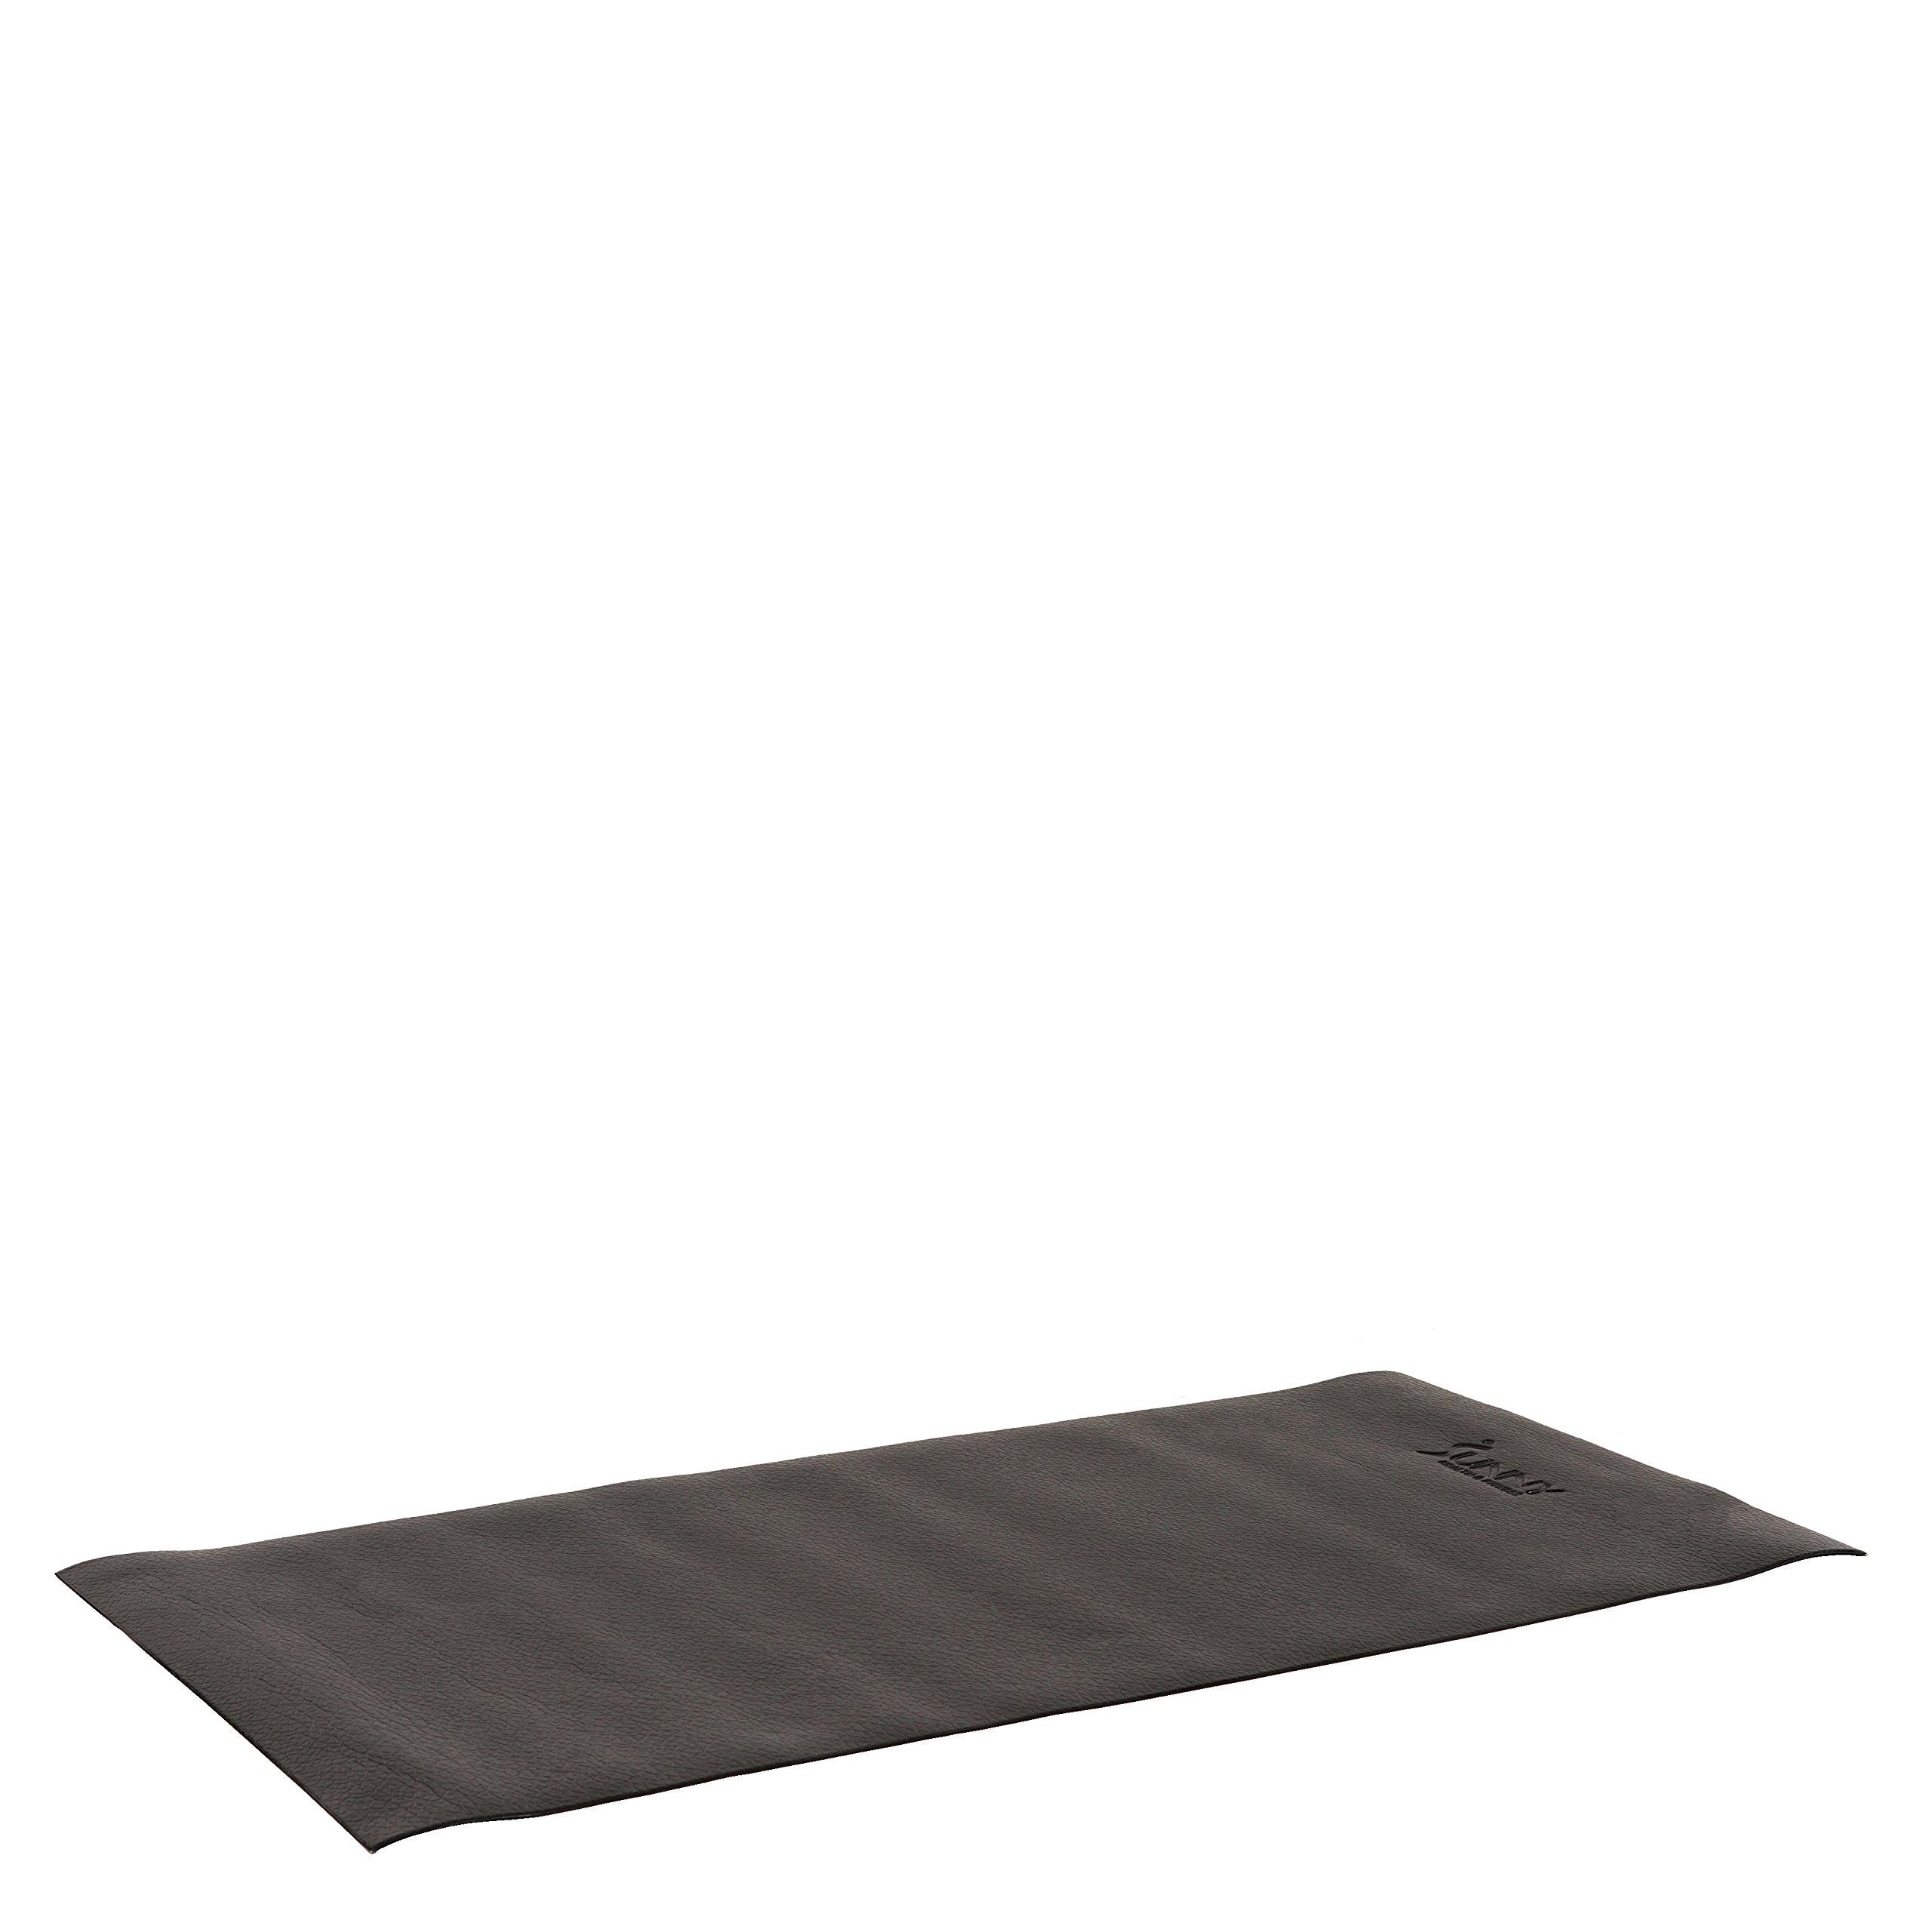 Sunny Health & Fitness No. 083 Fitness Equipment Floor Mat, Black, 4' x 2'